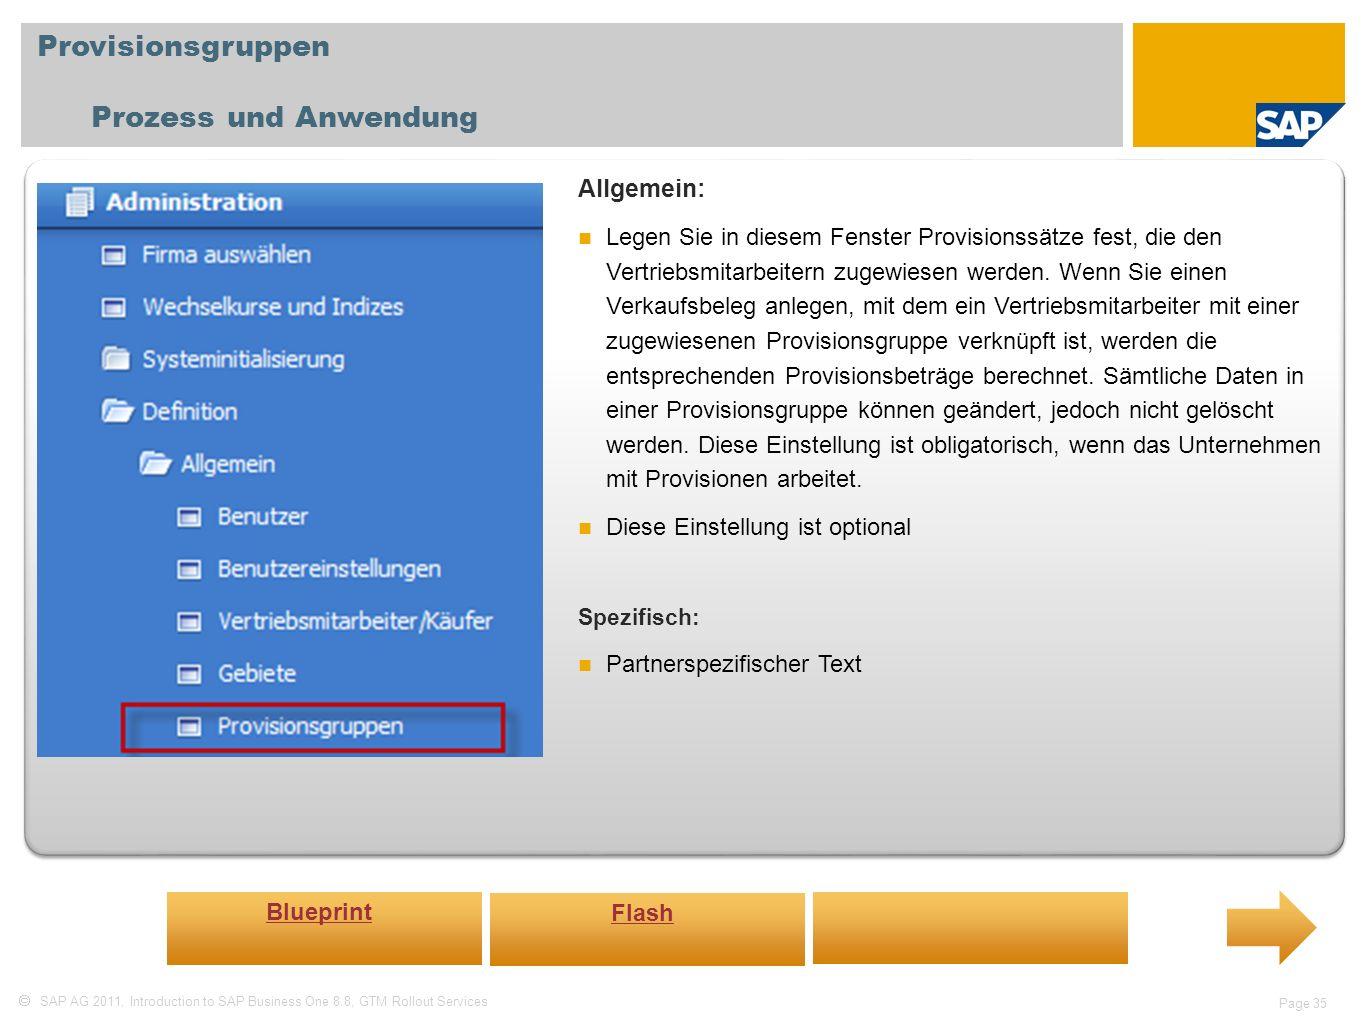 SAP AG 2011, Introduction to SAP Business One 8.8, GTM Rollout Services Page 35 Provisionsgruppen Prozess und Anwendung Allgemein: Legen Sie in diesem